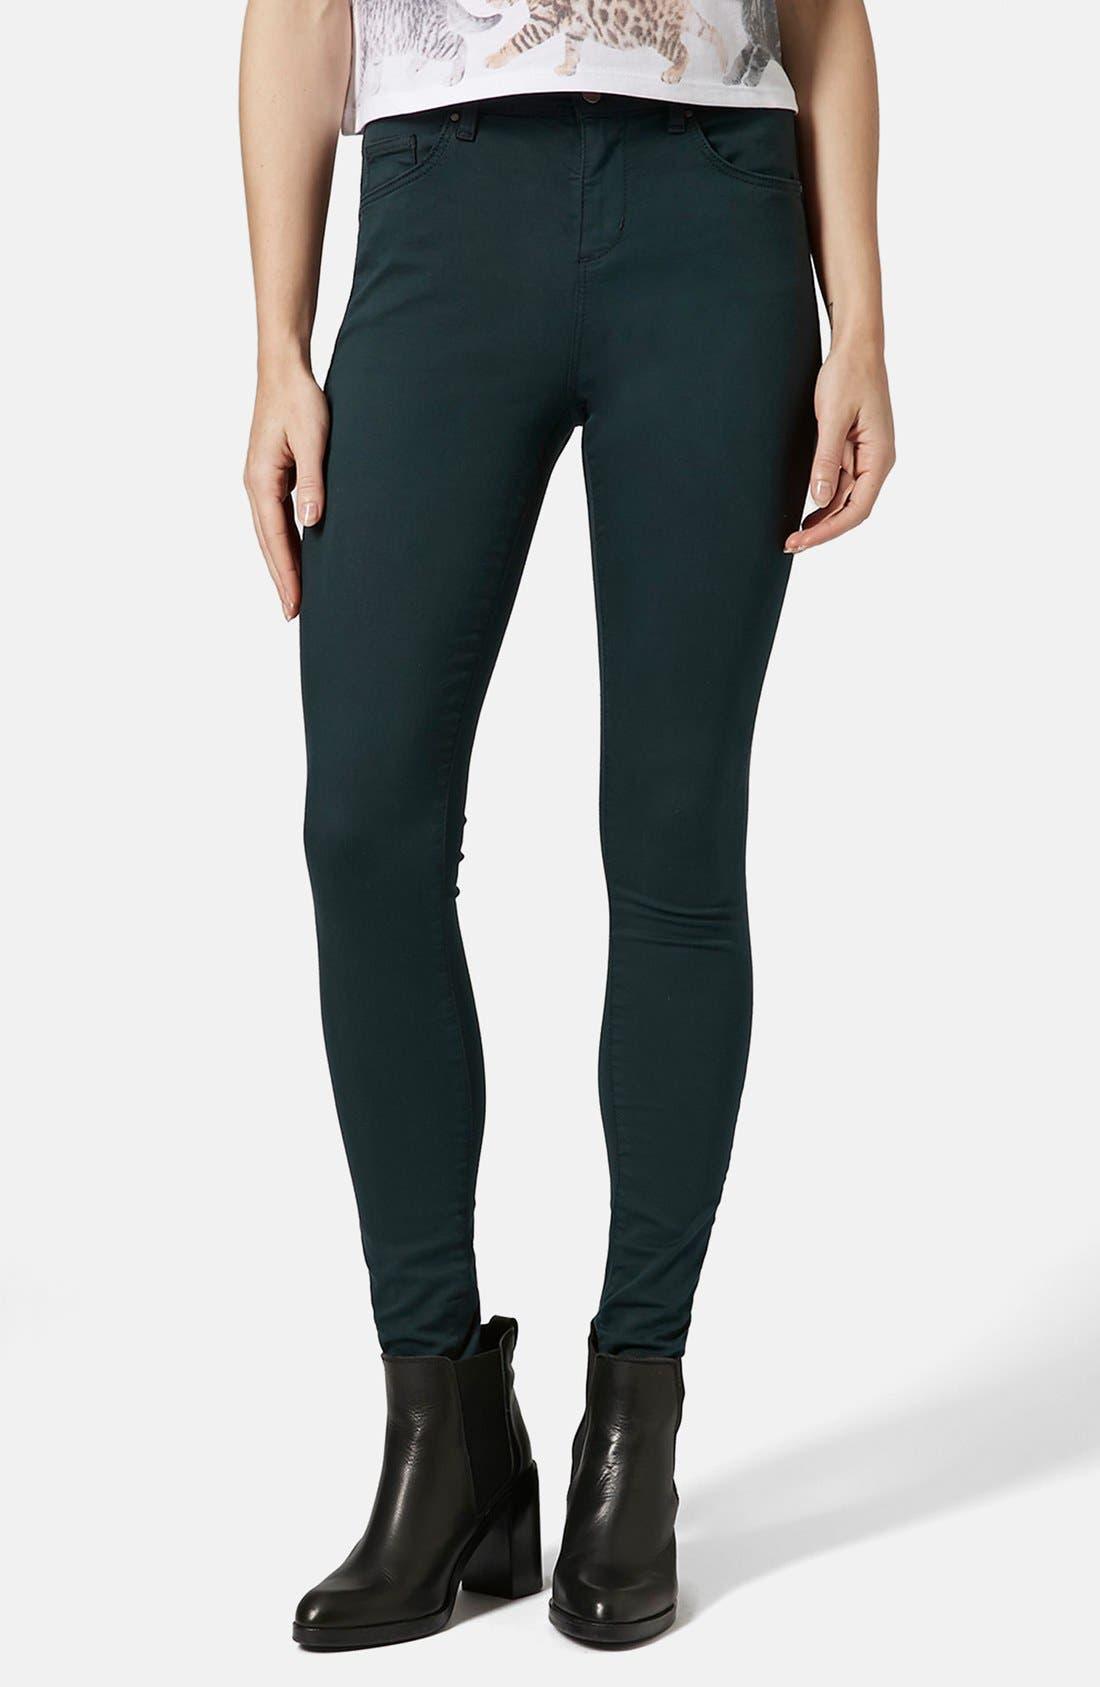 Main Image - Topshop Moto 'Leigh' High Rise Skinny Jeans (Teal) (Regular & Short)